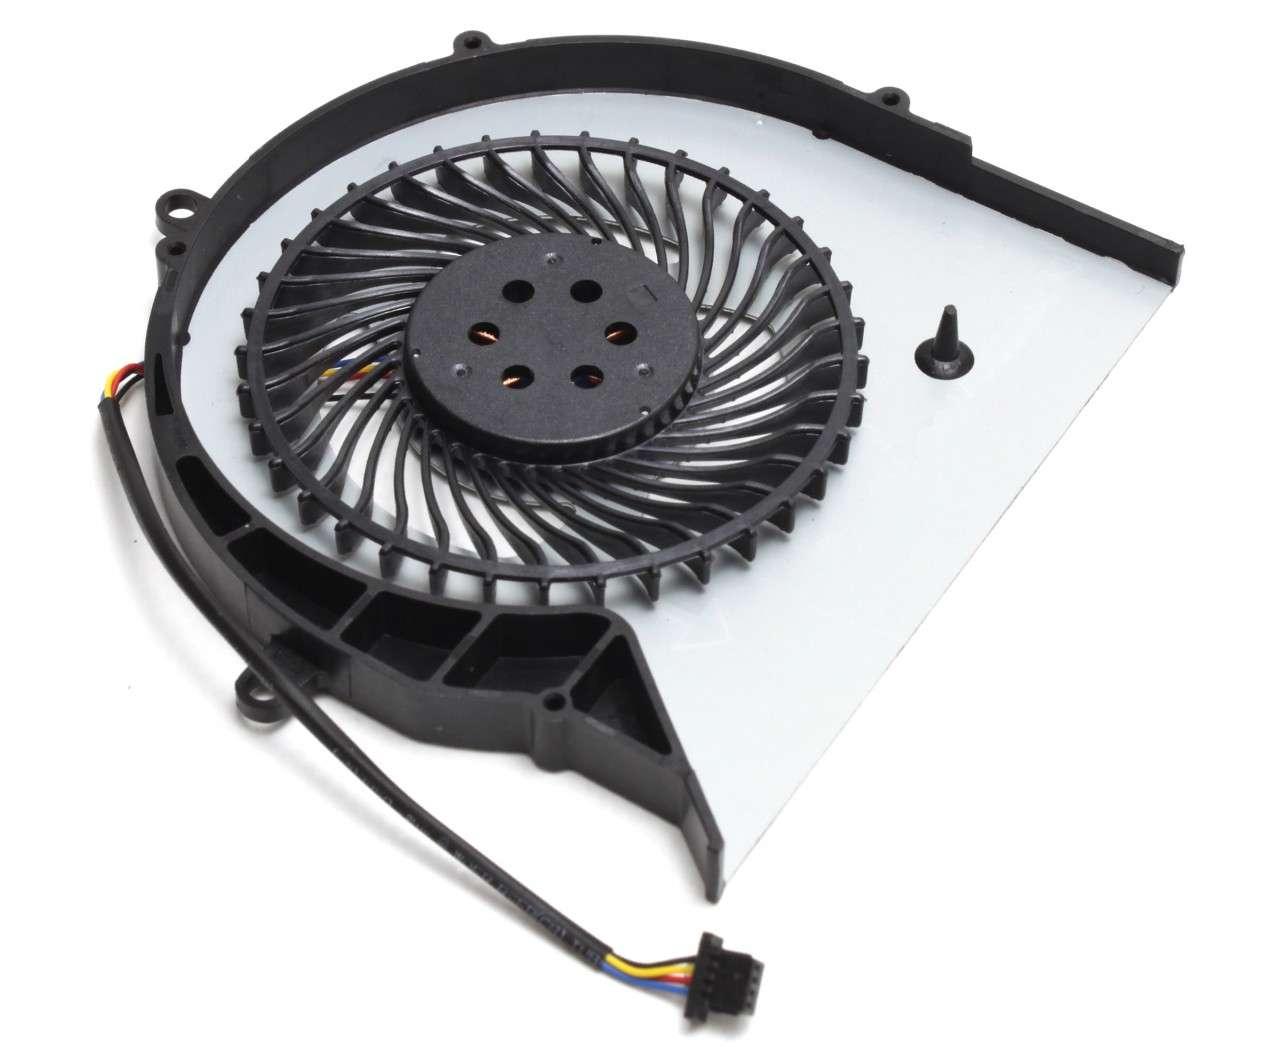 Cooler procesor CPU laptop Asus GL703VM imagine powerlaptop.ro 2021